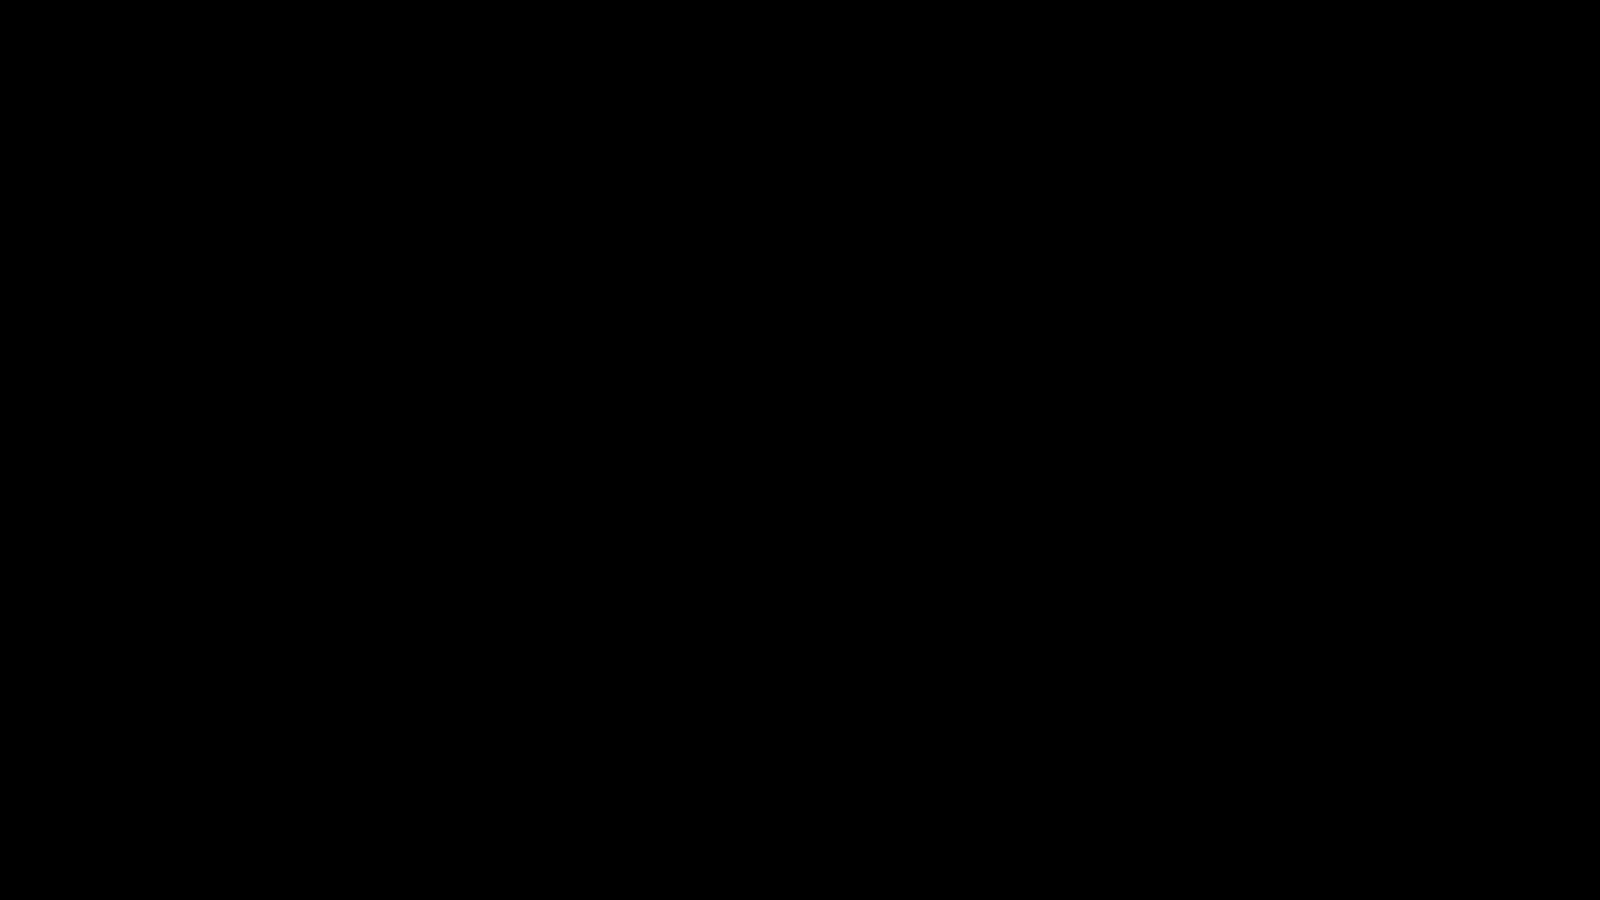 Tammerneonille mainostornien pienoismallit